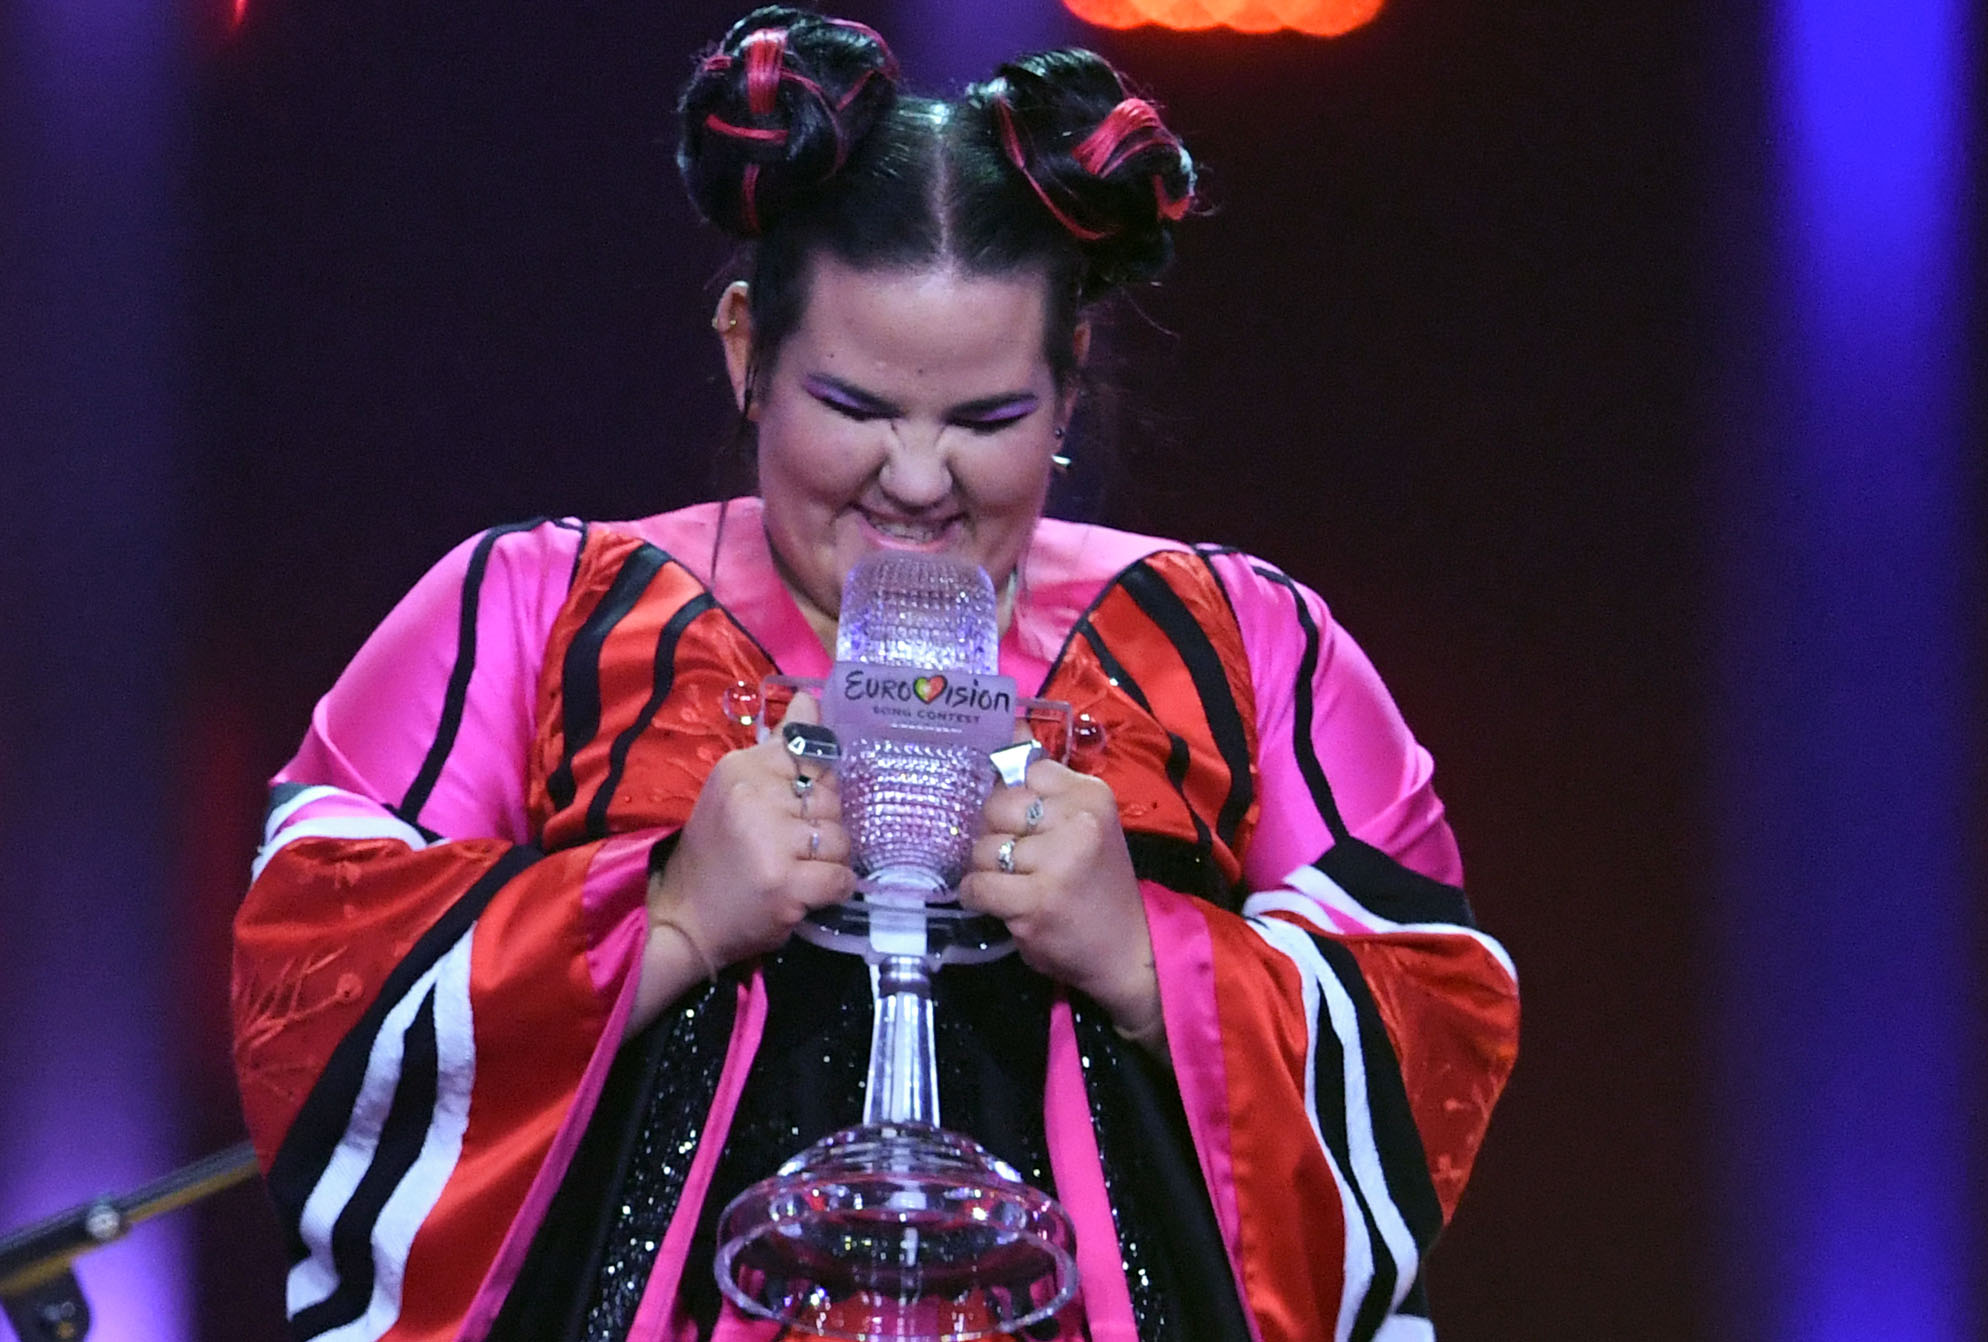 Israel's Netta Barzilai wins Eurovision 2018